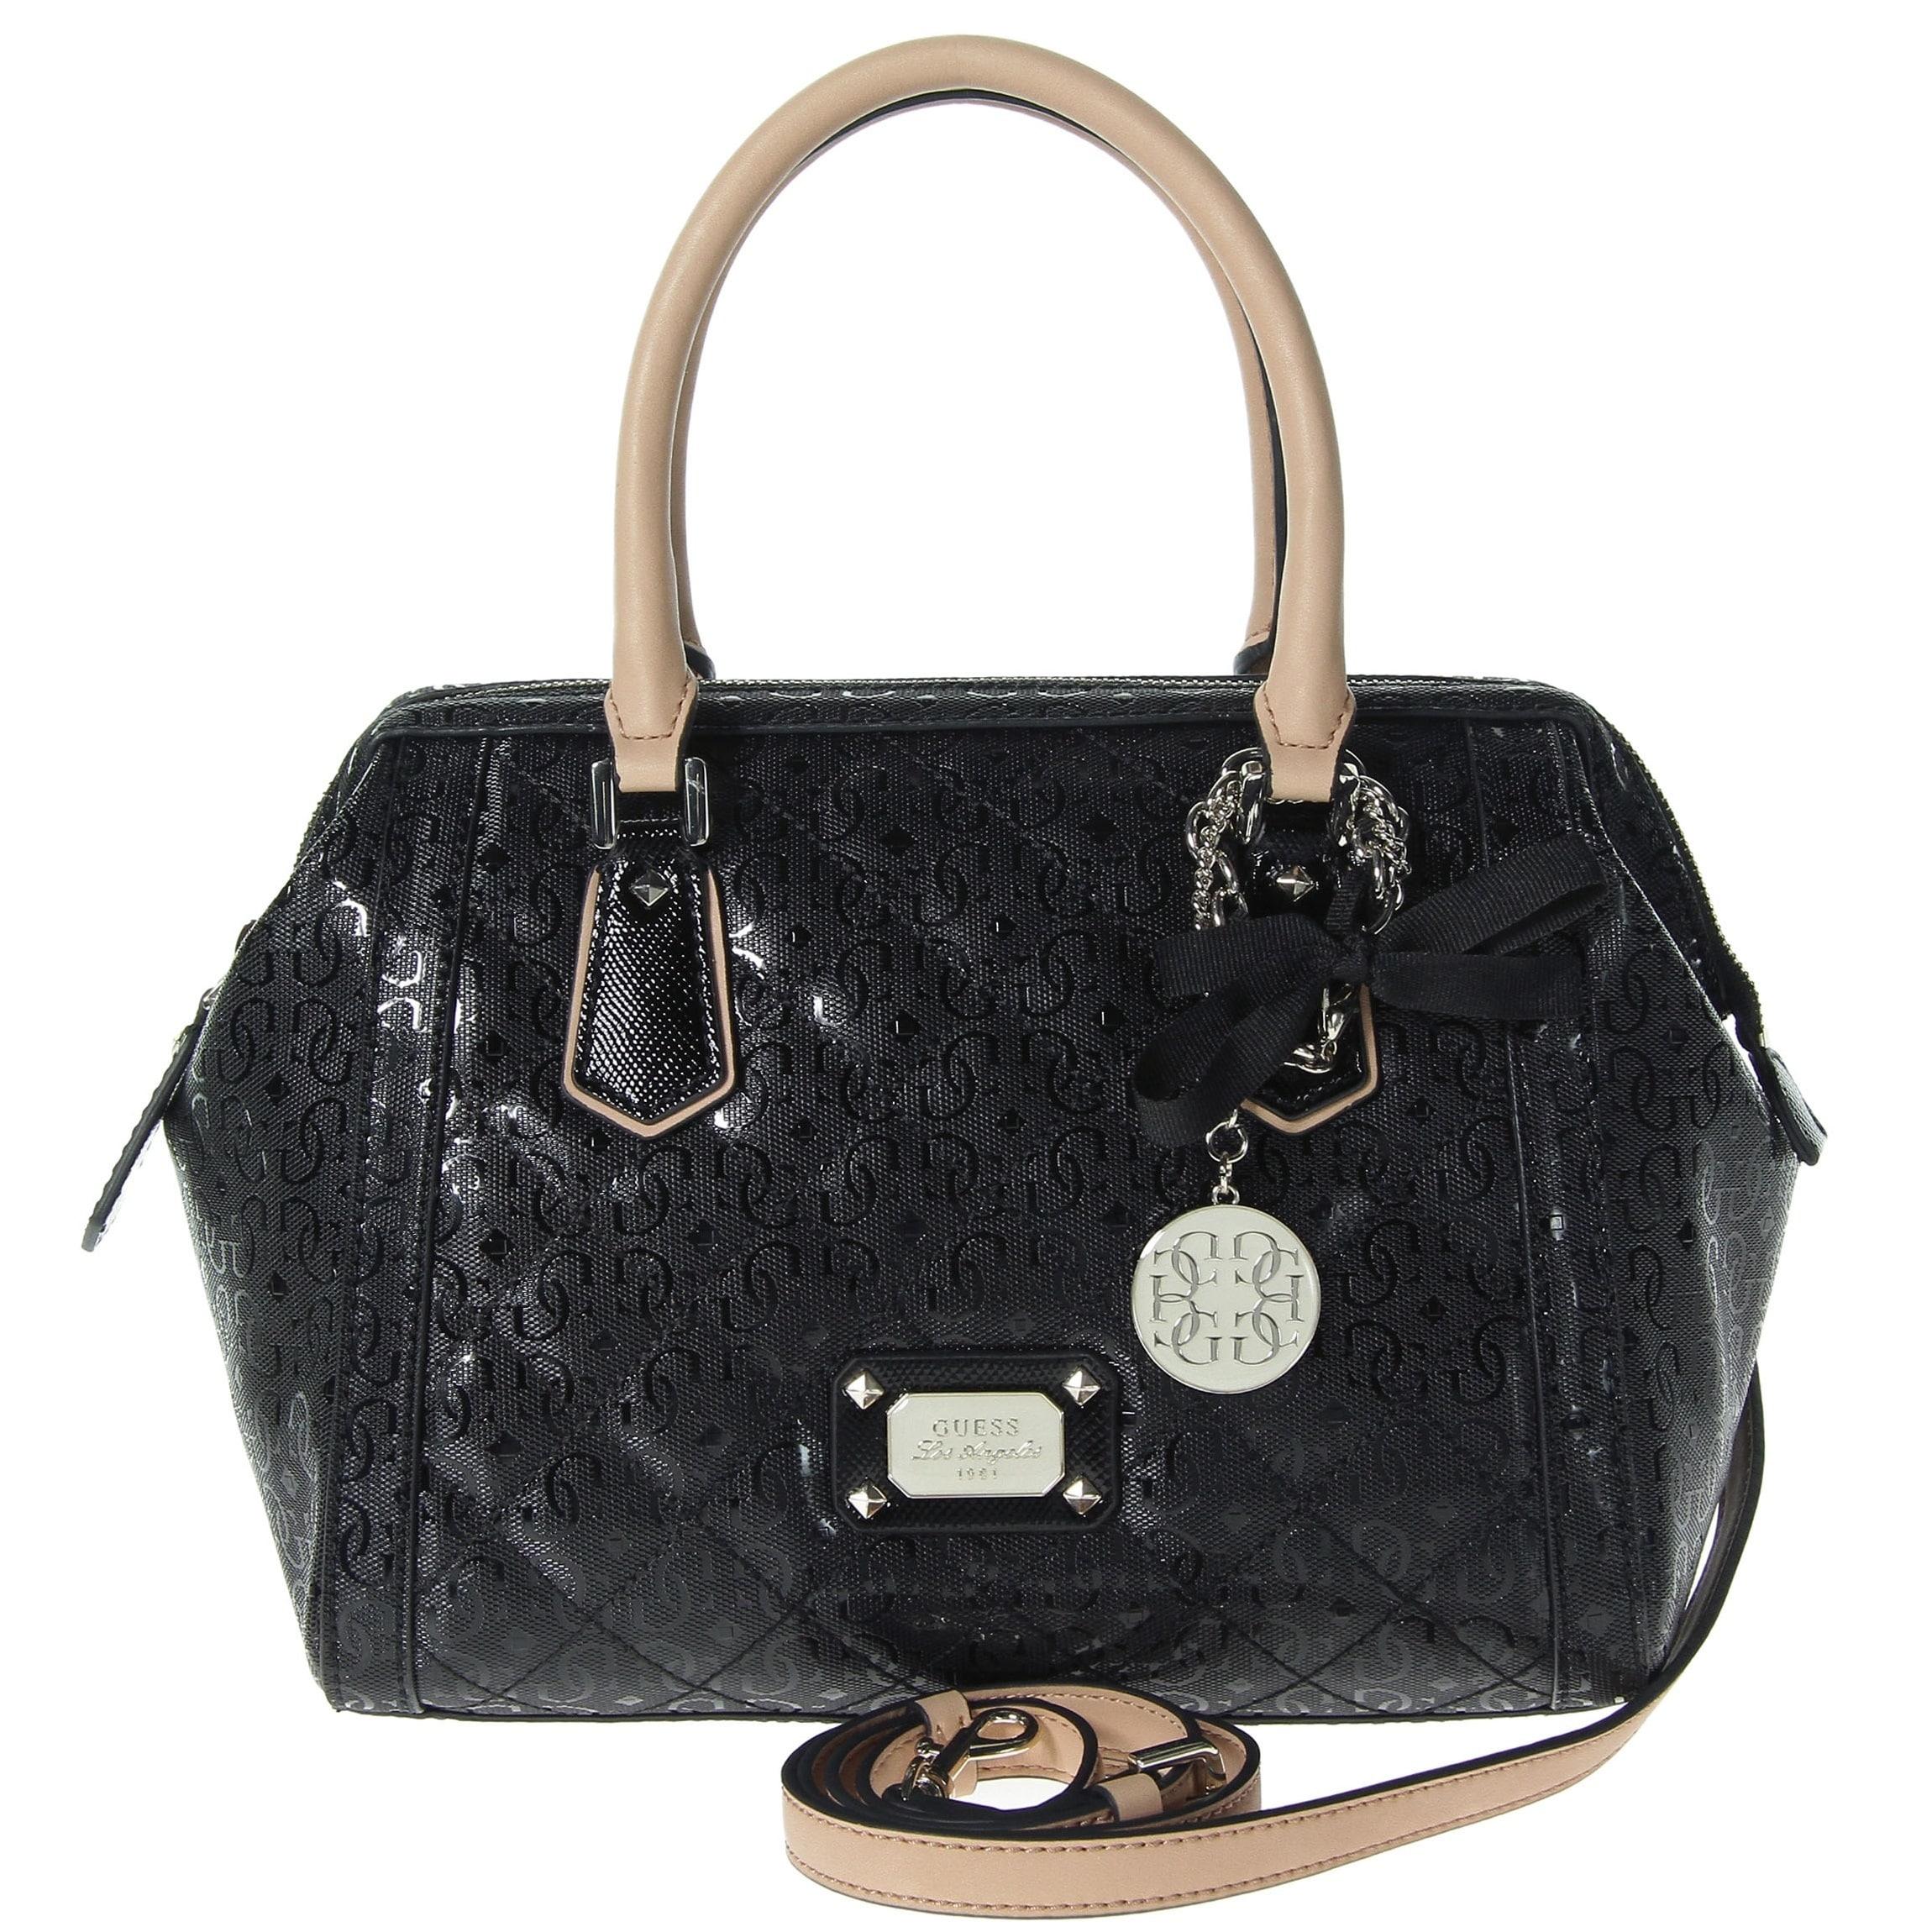 "Guess Women's Juliet Frame Satchel Bag (Black), Size 10"" ..."